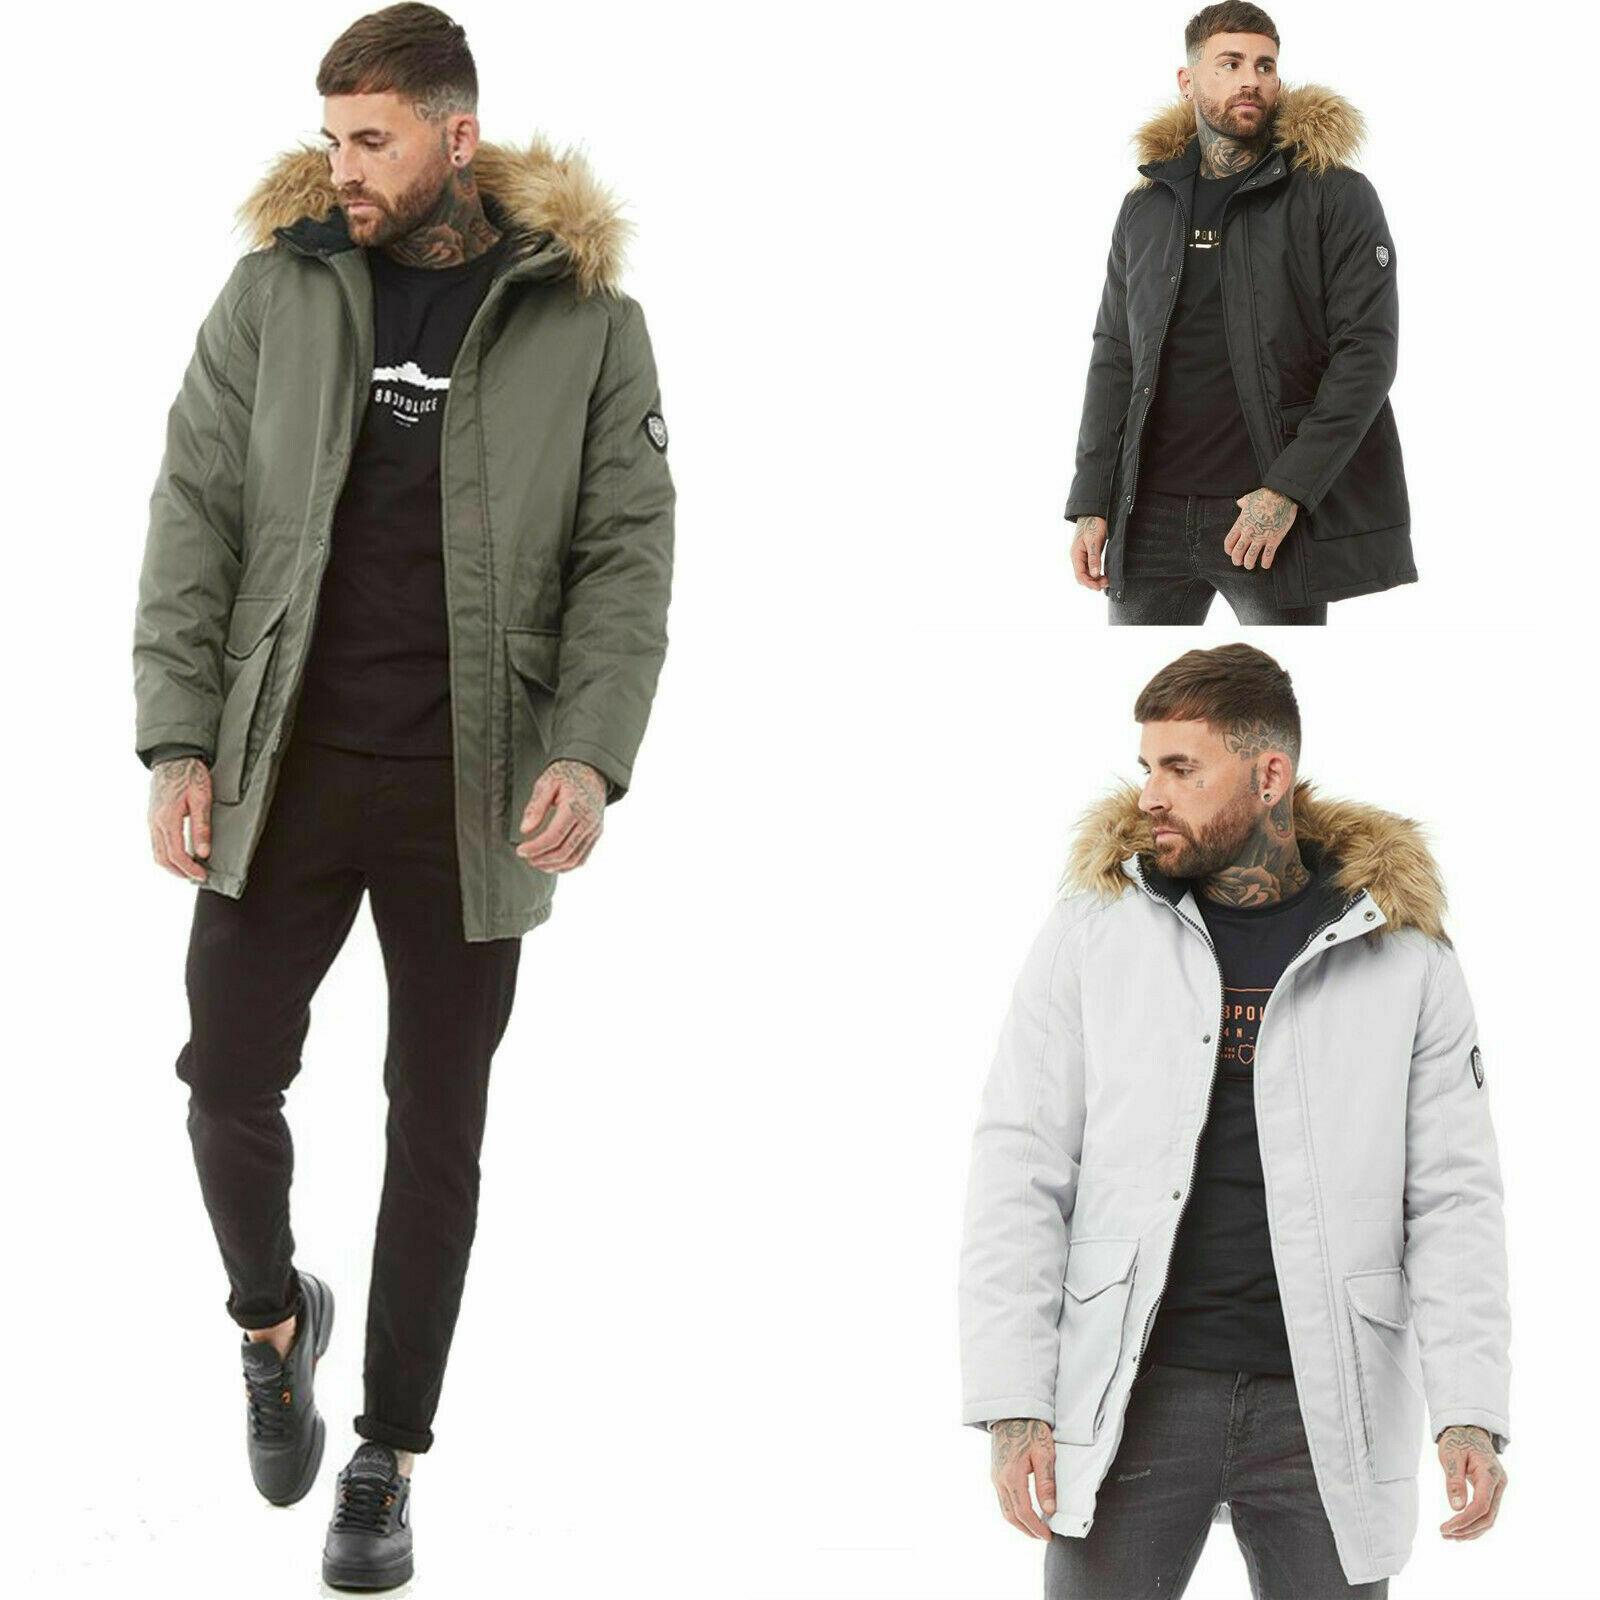 Parka Jacket Fur Trim Hooded Winter Warm Long Padded Coat New